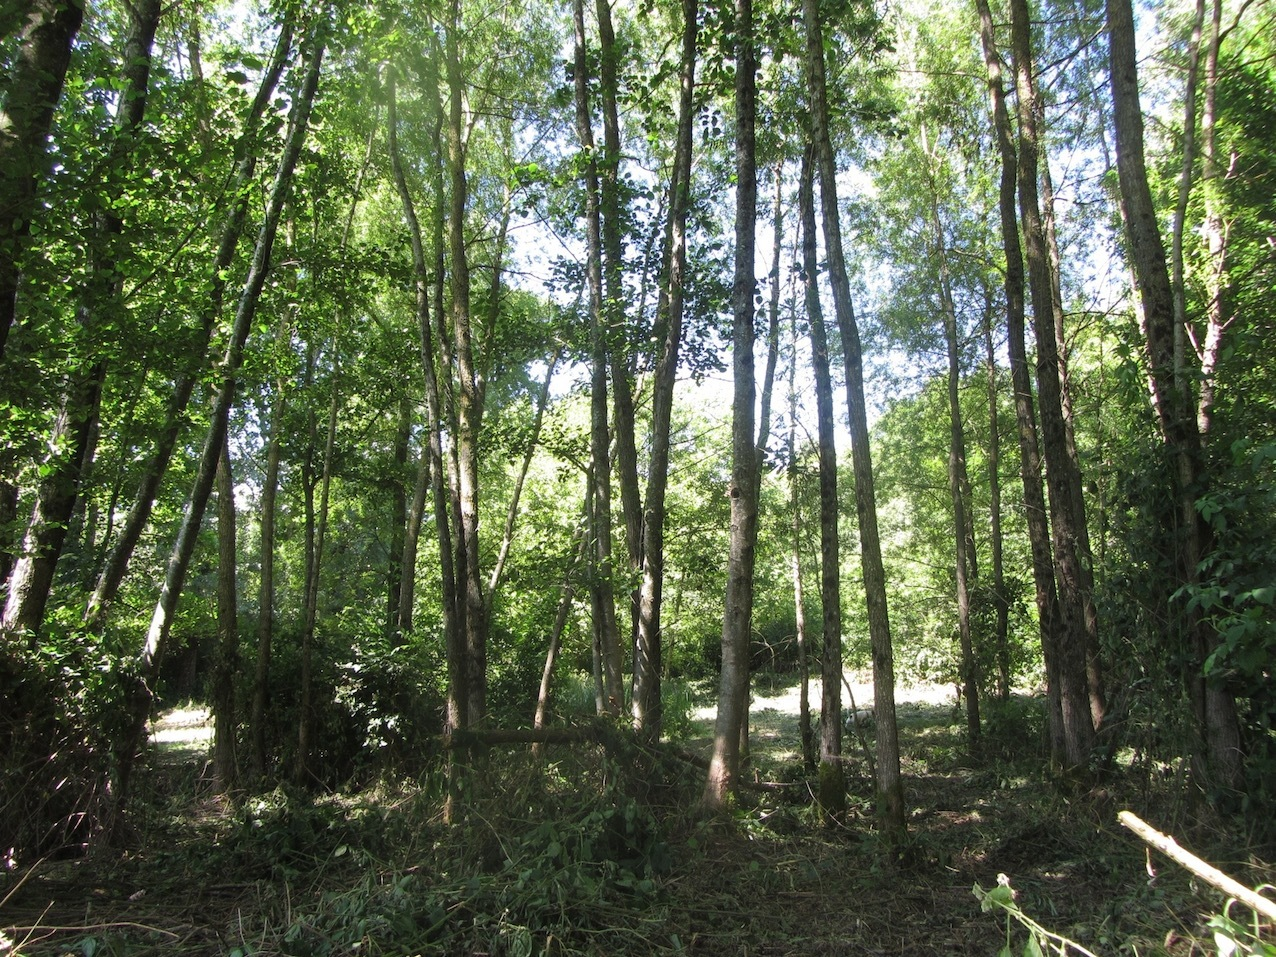 woodland walks at Le Choisel, Normandy, France